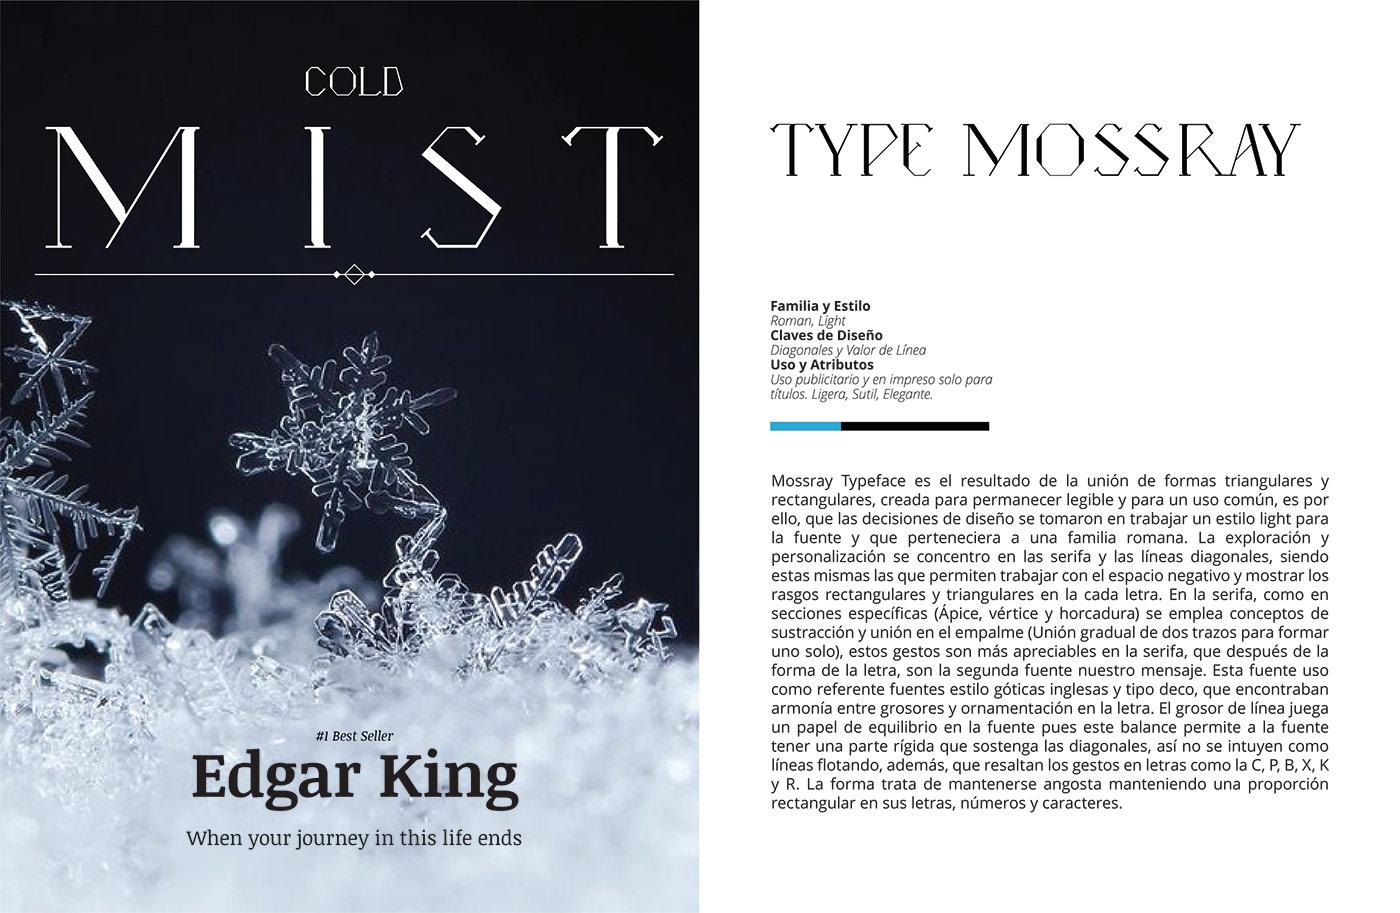 Carta Tipográfica / Type Mossray A8075b72765867.5bf2e5b4b79f5